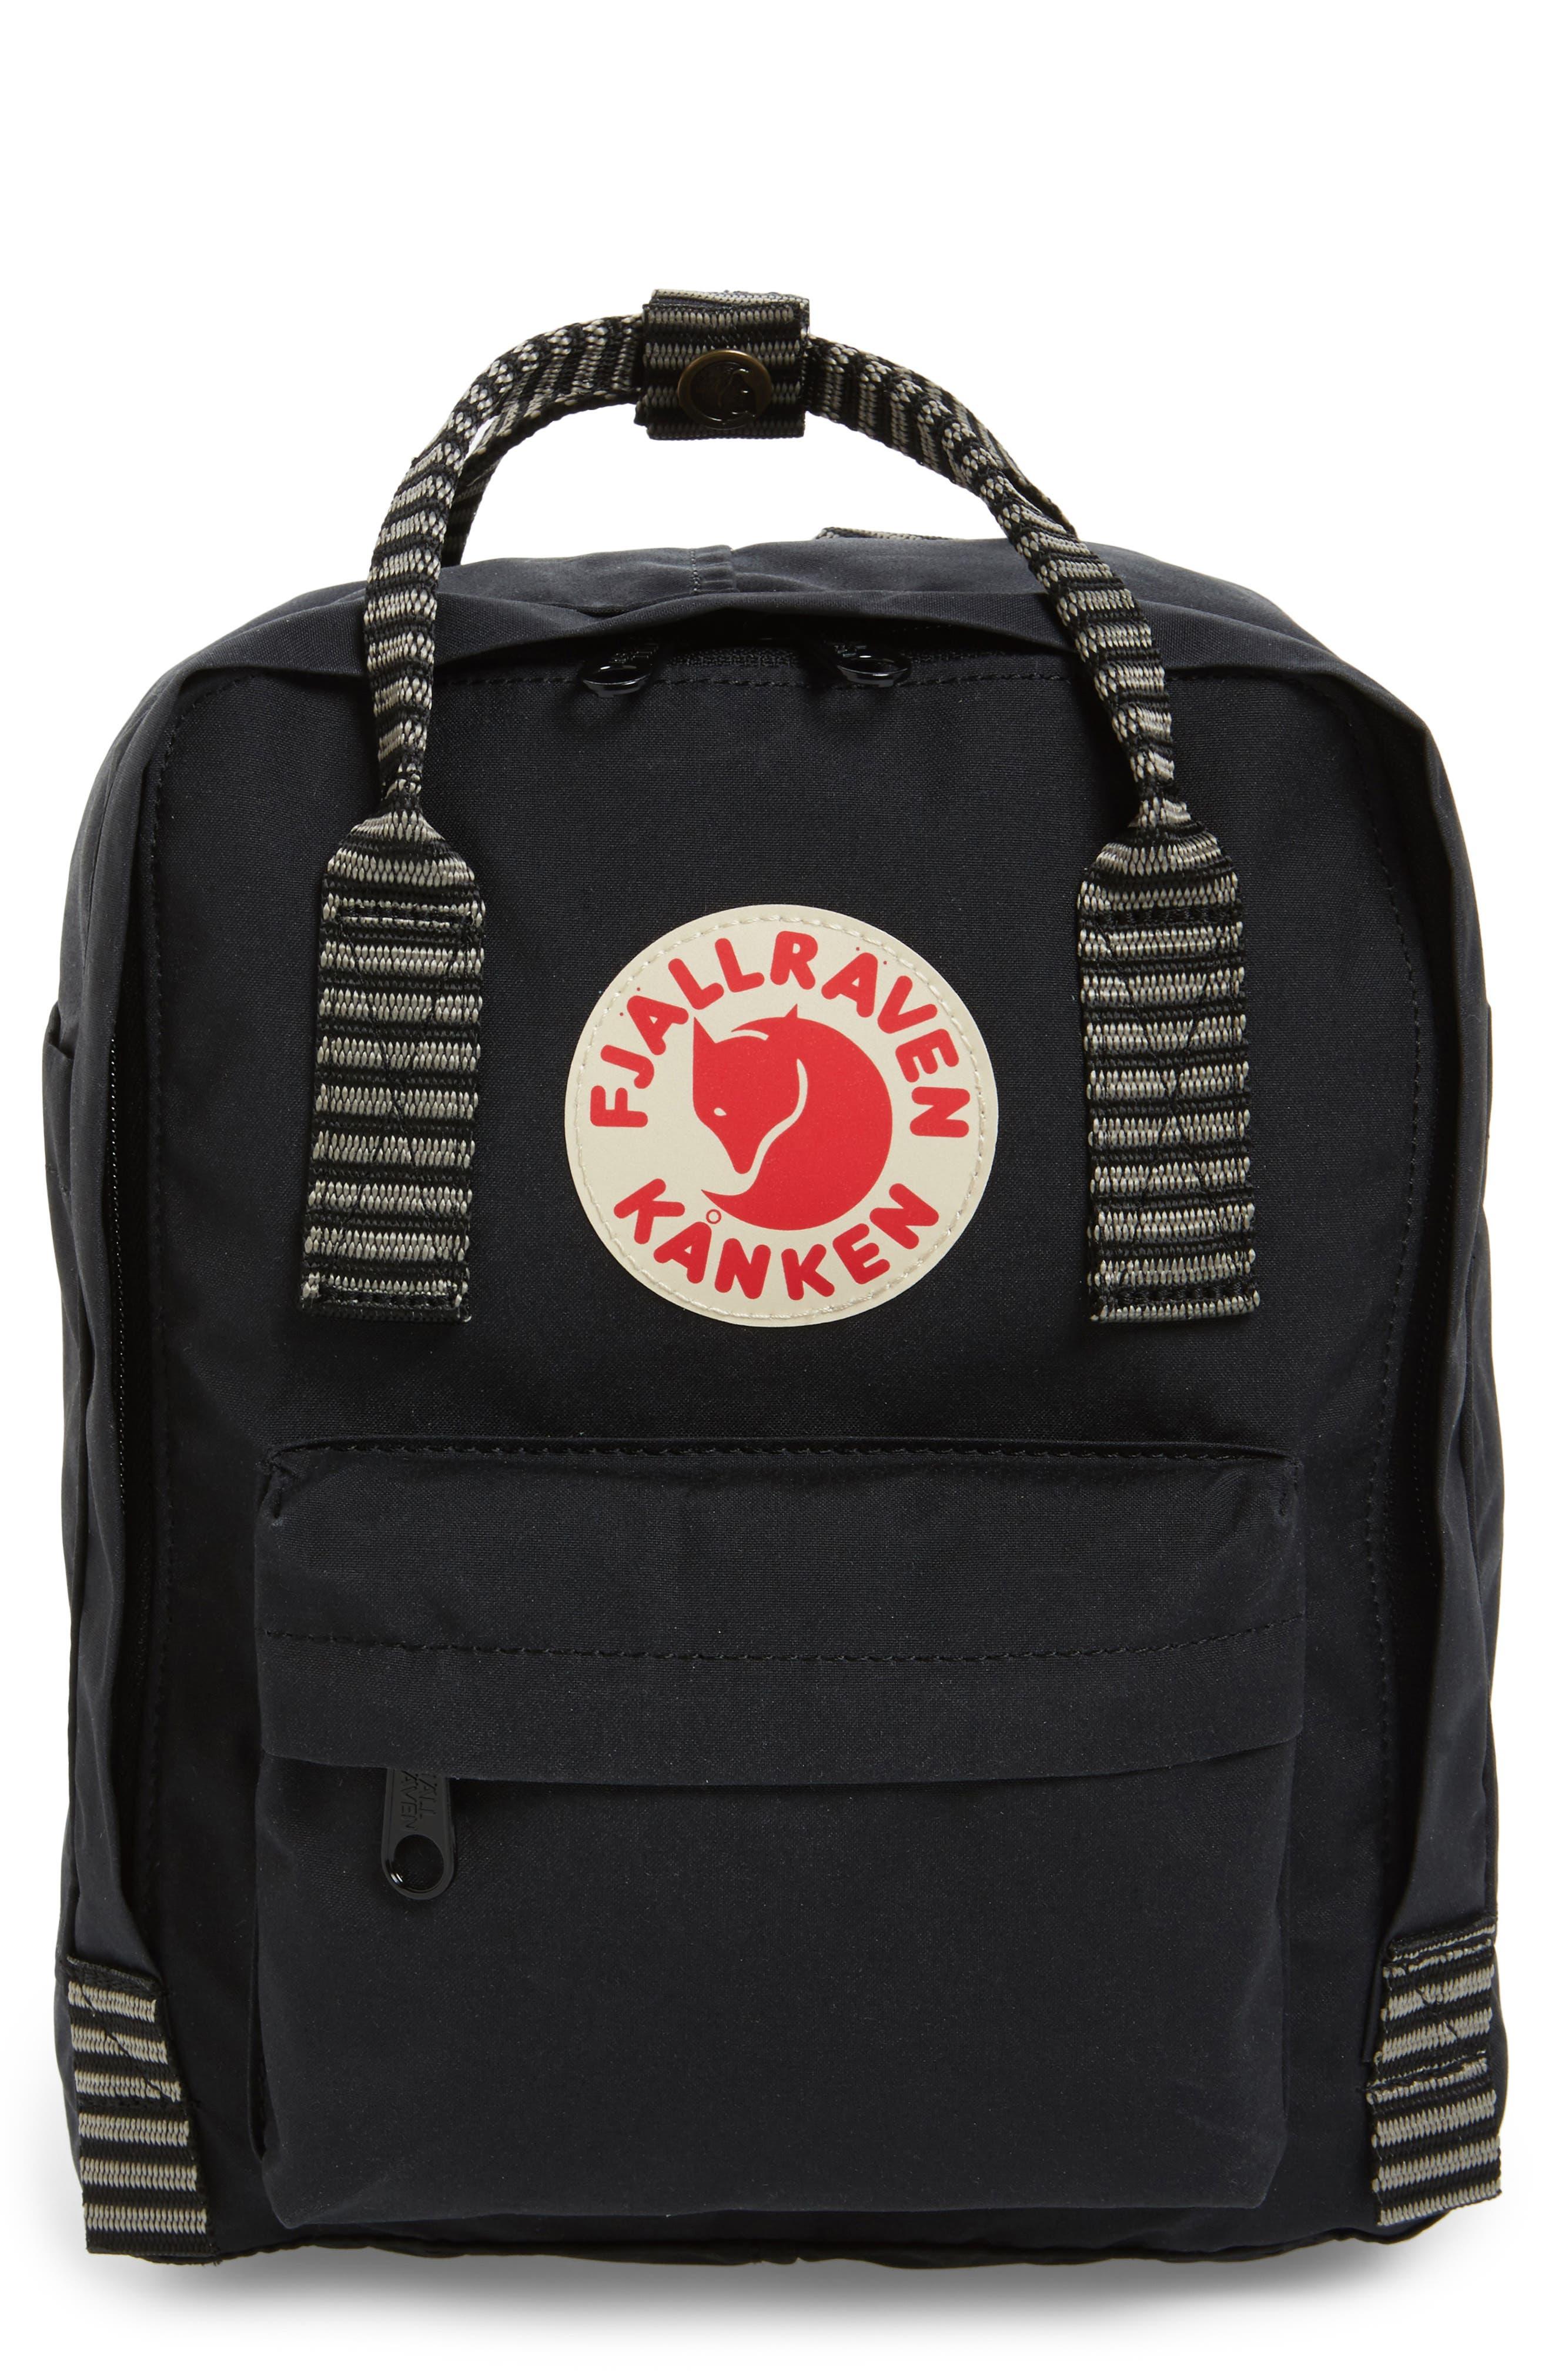 Alternate Image 1 Selected - Fjällräven 'Mini Kånken' Water Resistant Backpack